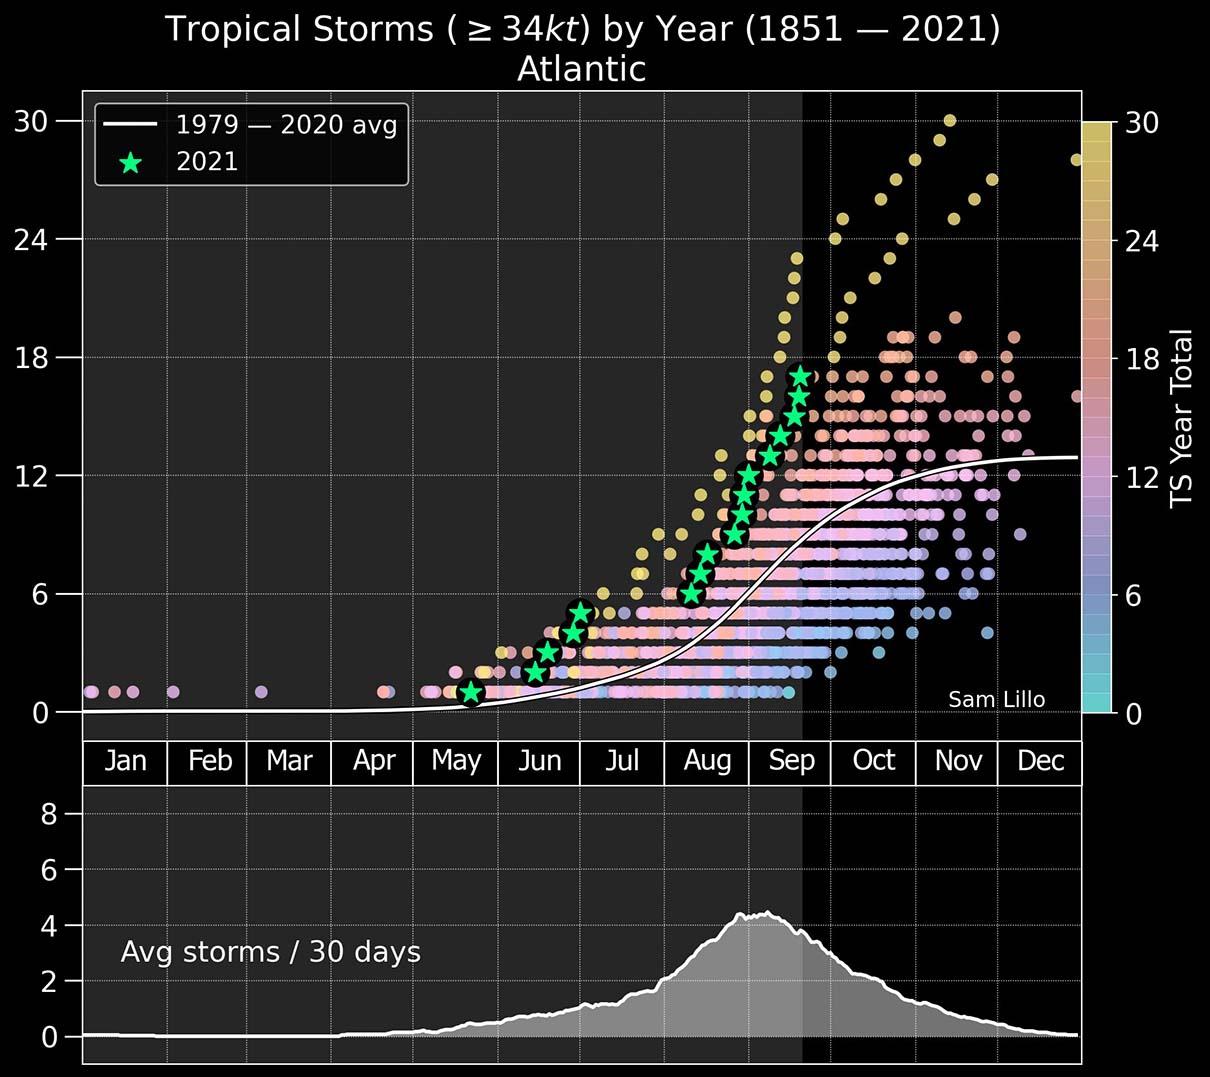 atlantic-hurricane-season-2021-major-storm-sam-caribbean-2005-and-2020-seasons